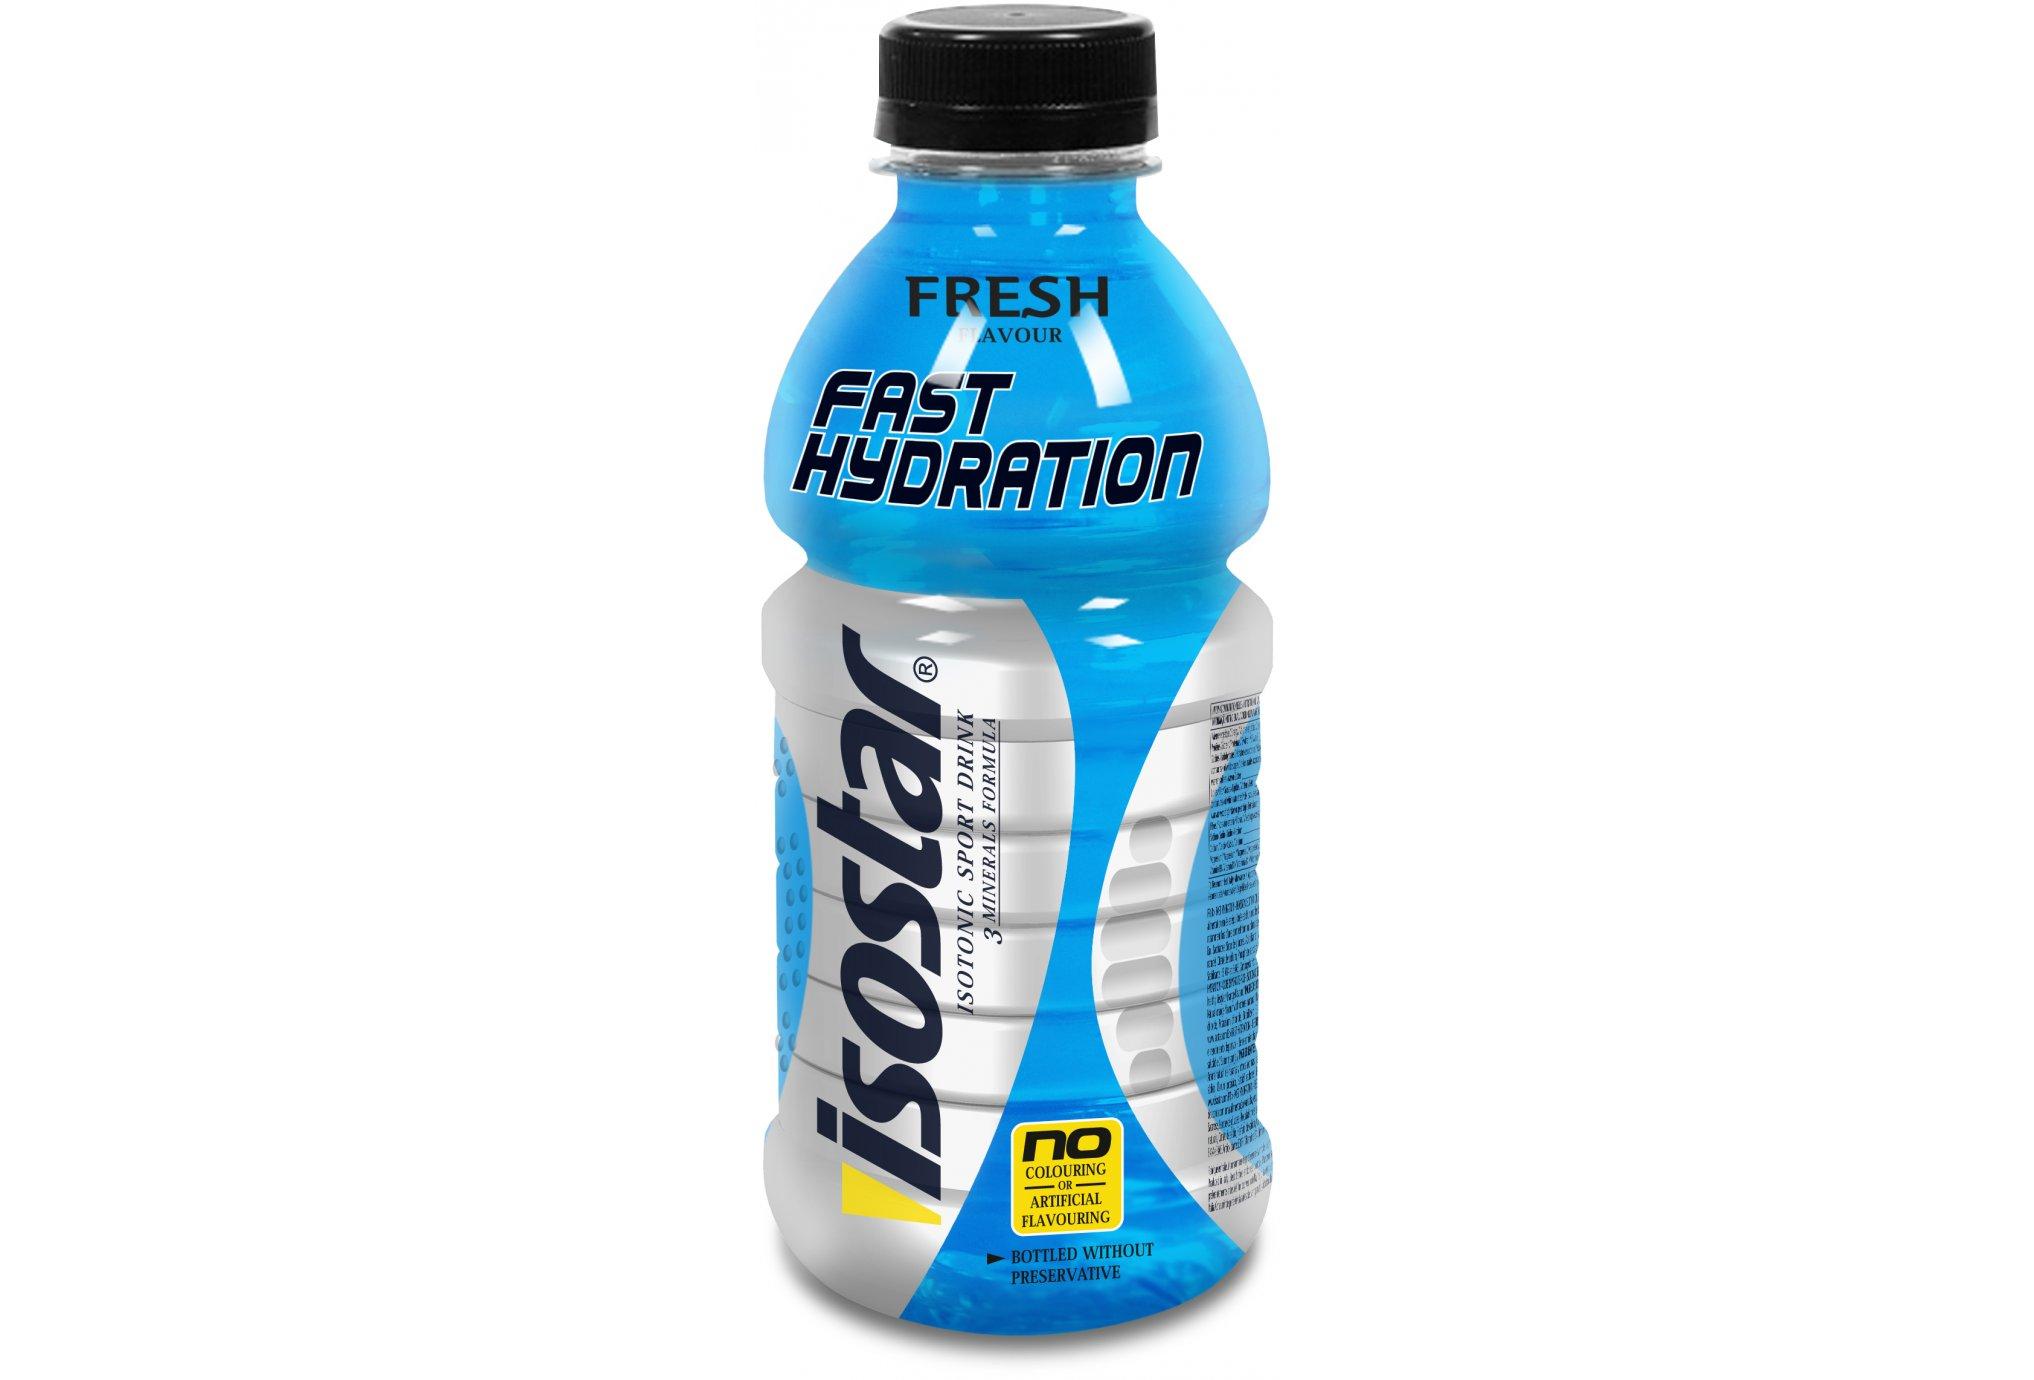 Isostar Fast Hydration - Fresh Diététique Boissons